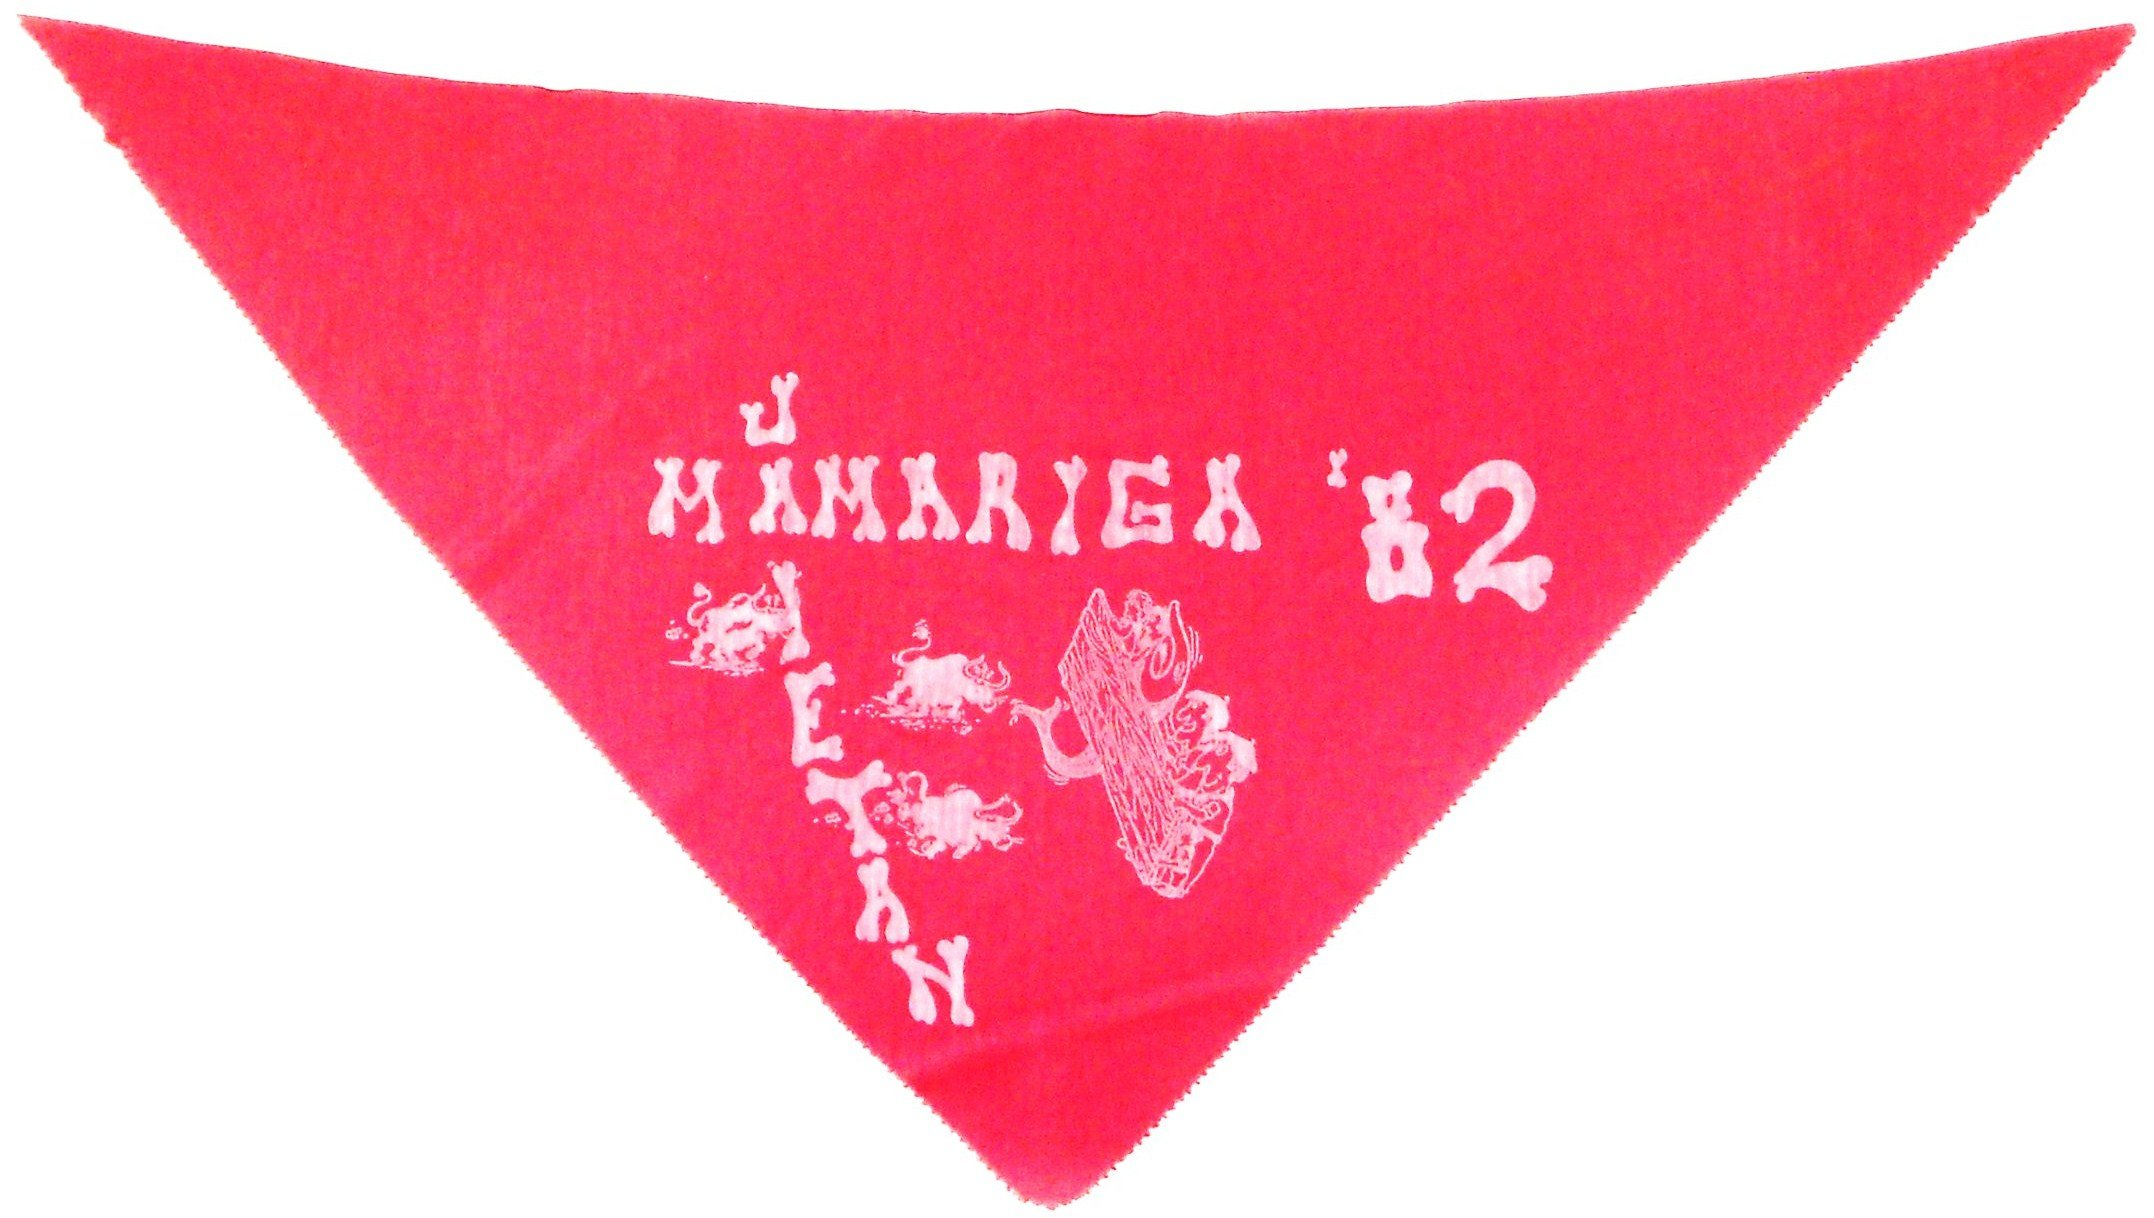 Pañuelo 1982